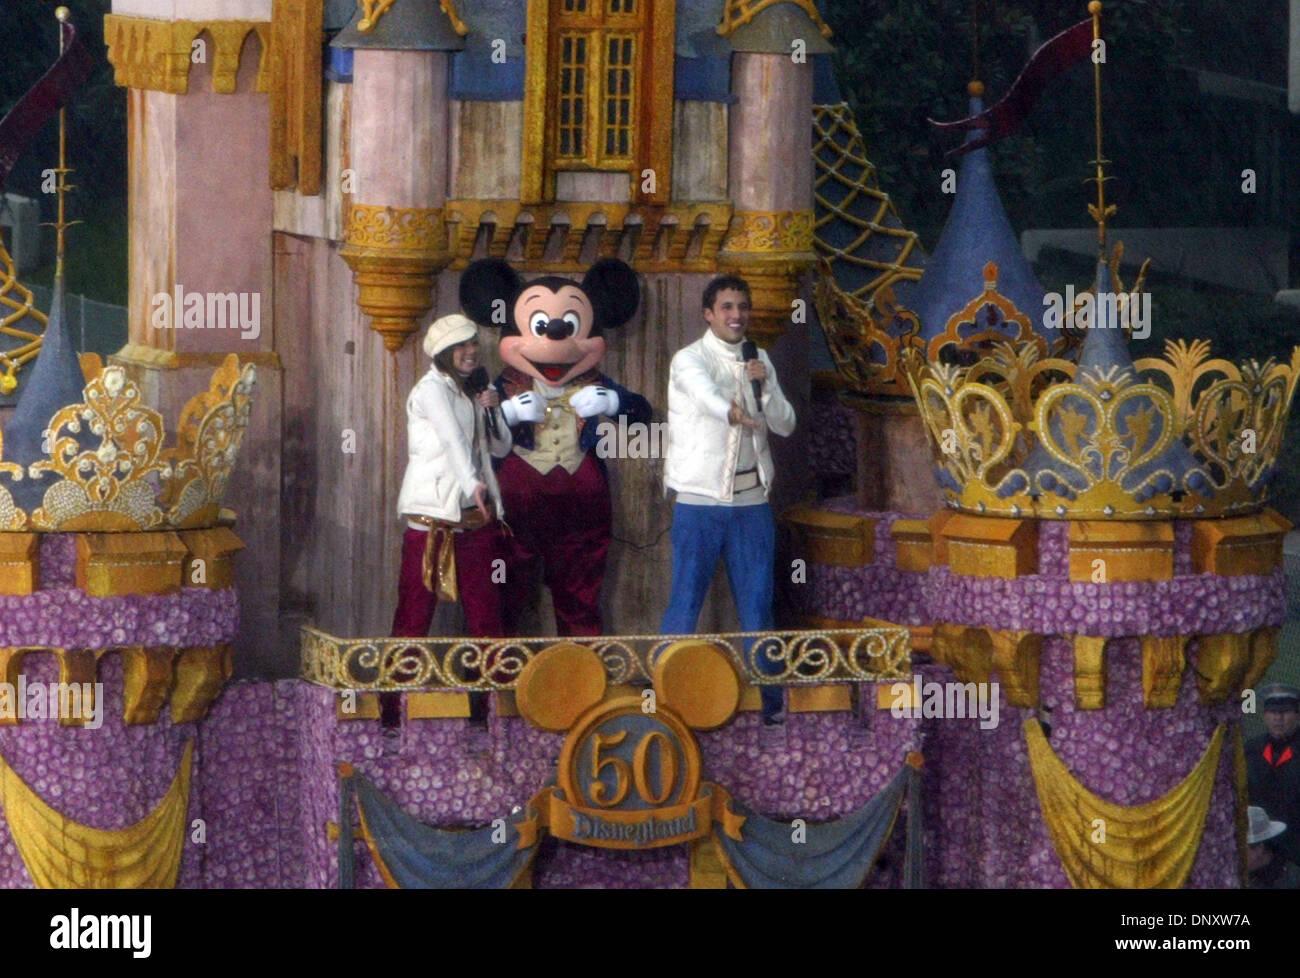 2. Januar 2006; Pasadena, Kalifornien, USA; Die Disney-Float-Antriebe hinunter Colorado Boulevard während der 117. Stockfoto